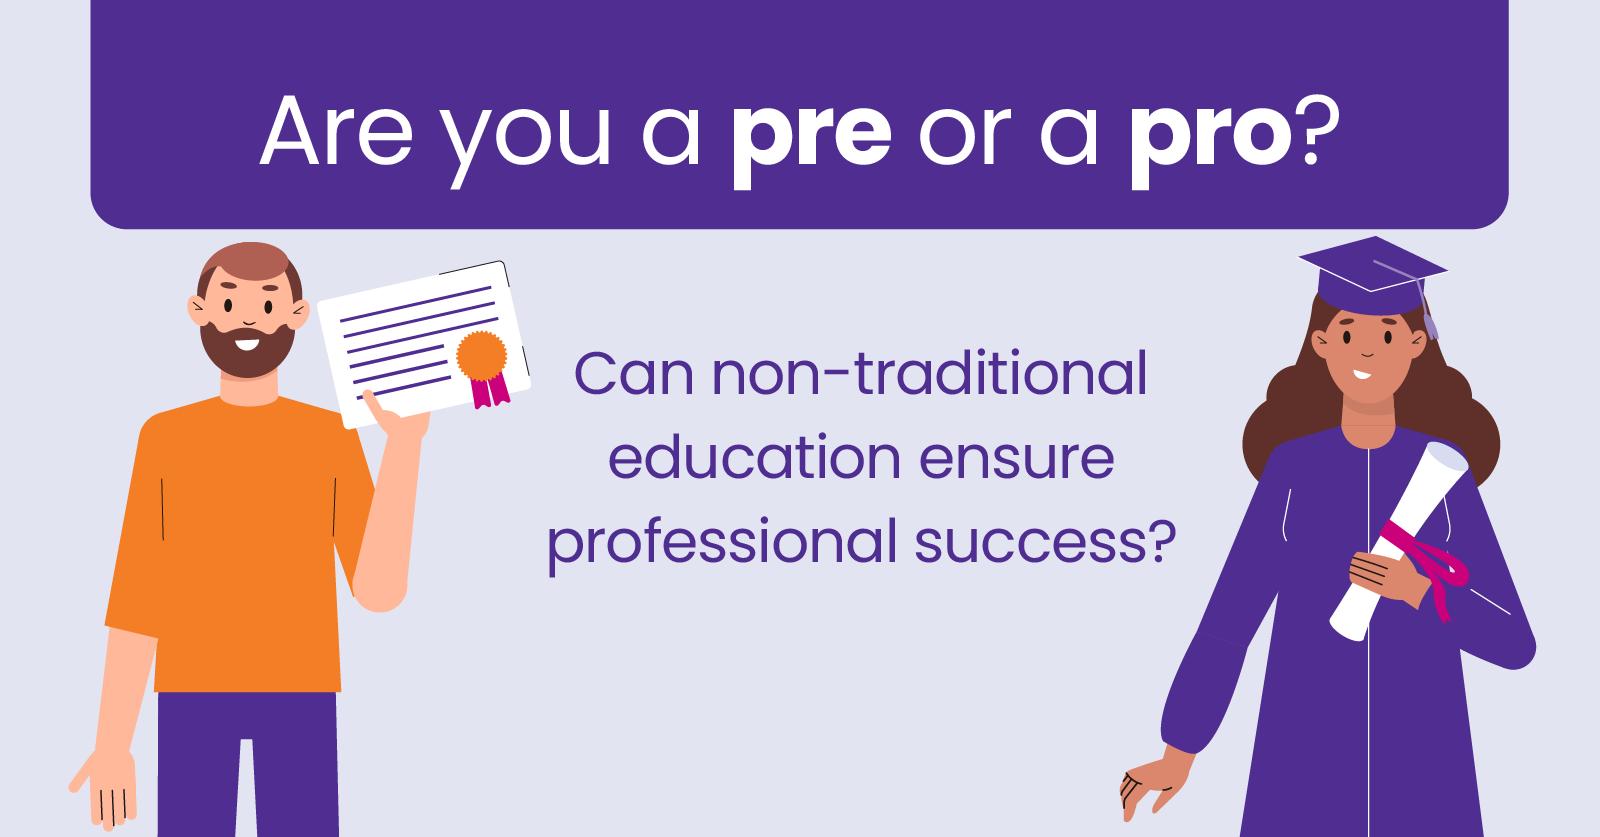 Wippli - are you a pre or a pro